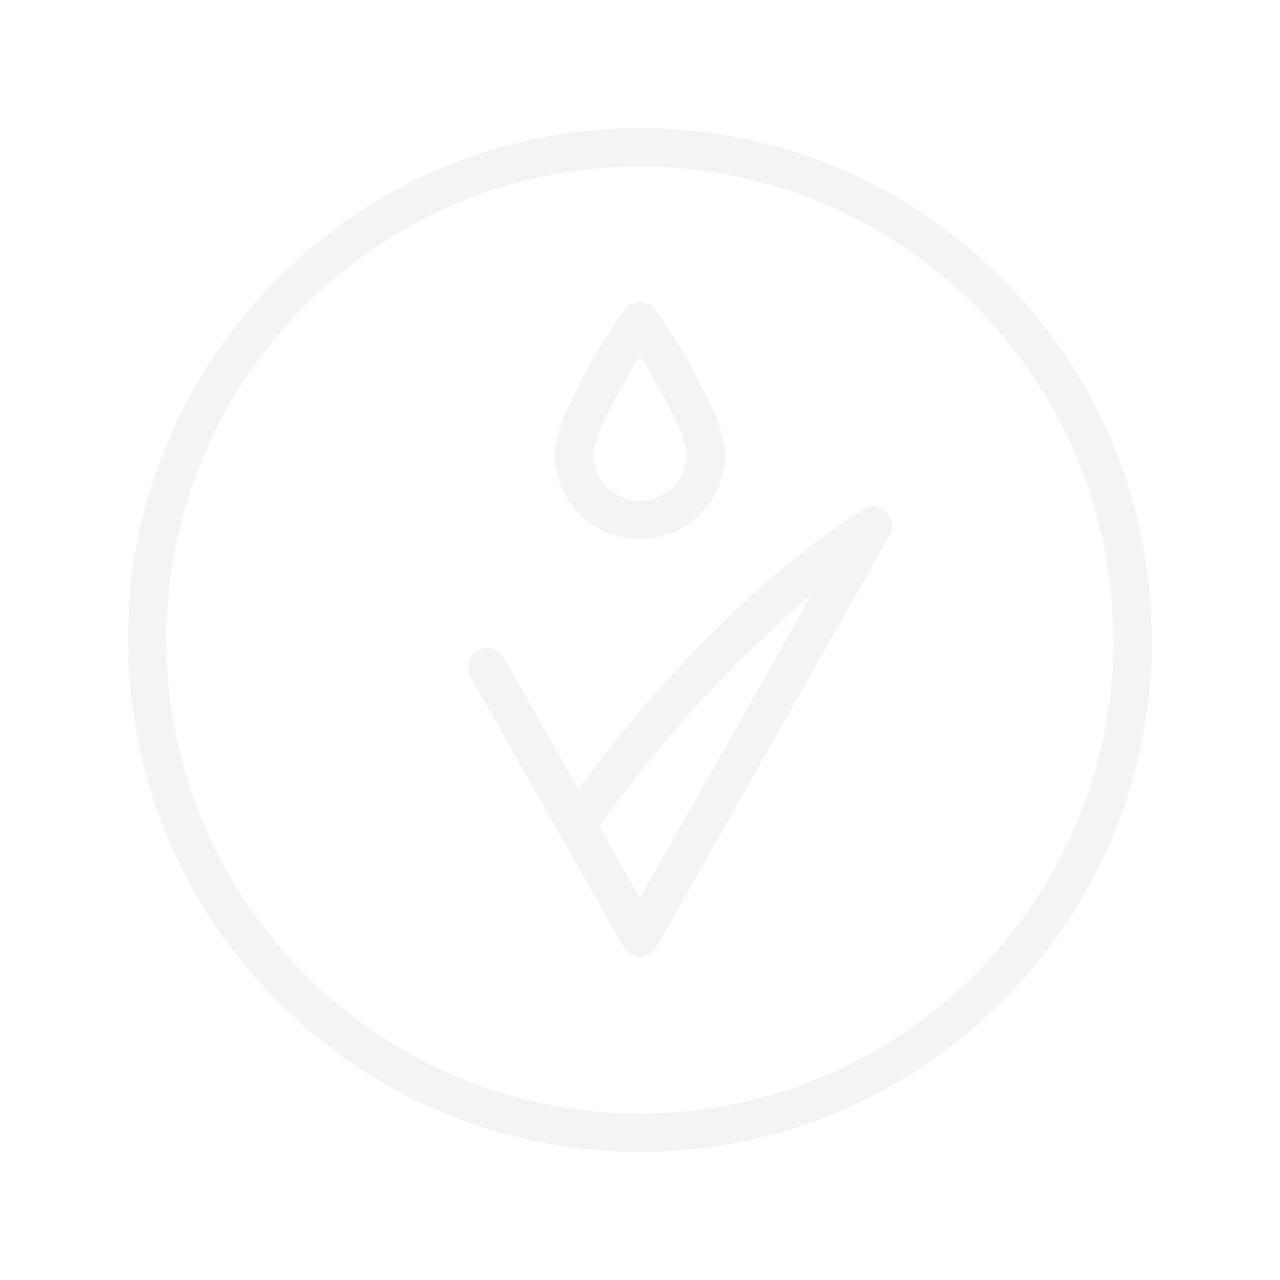 VAN CLEEF & ARPELS Reve Eau De Parfum